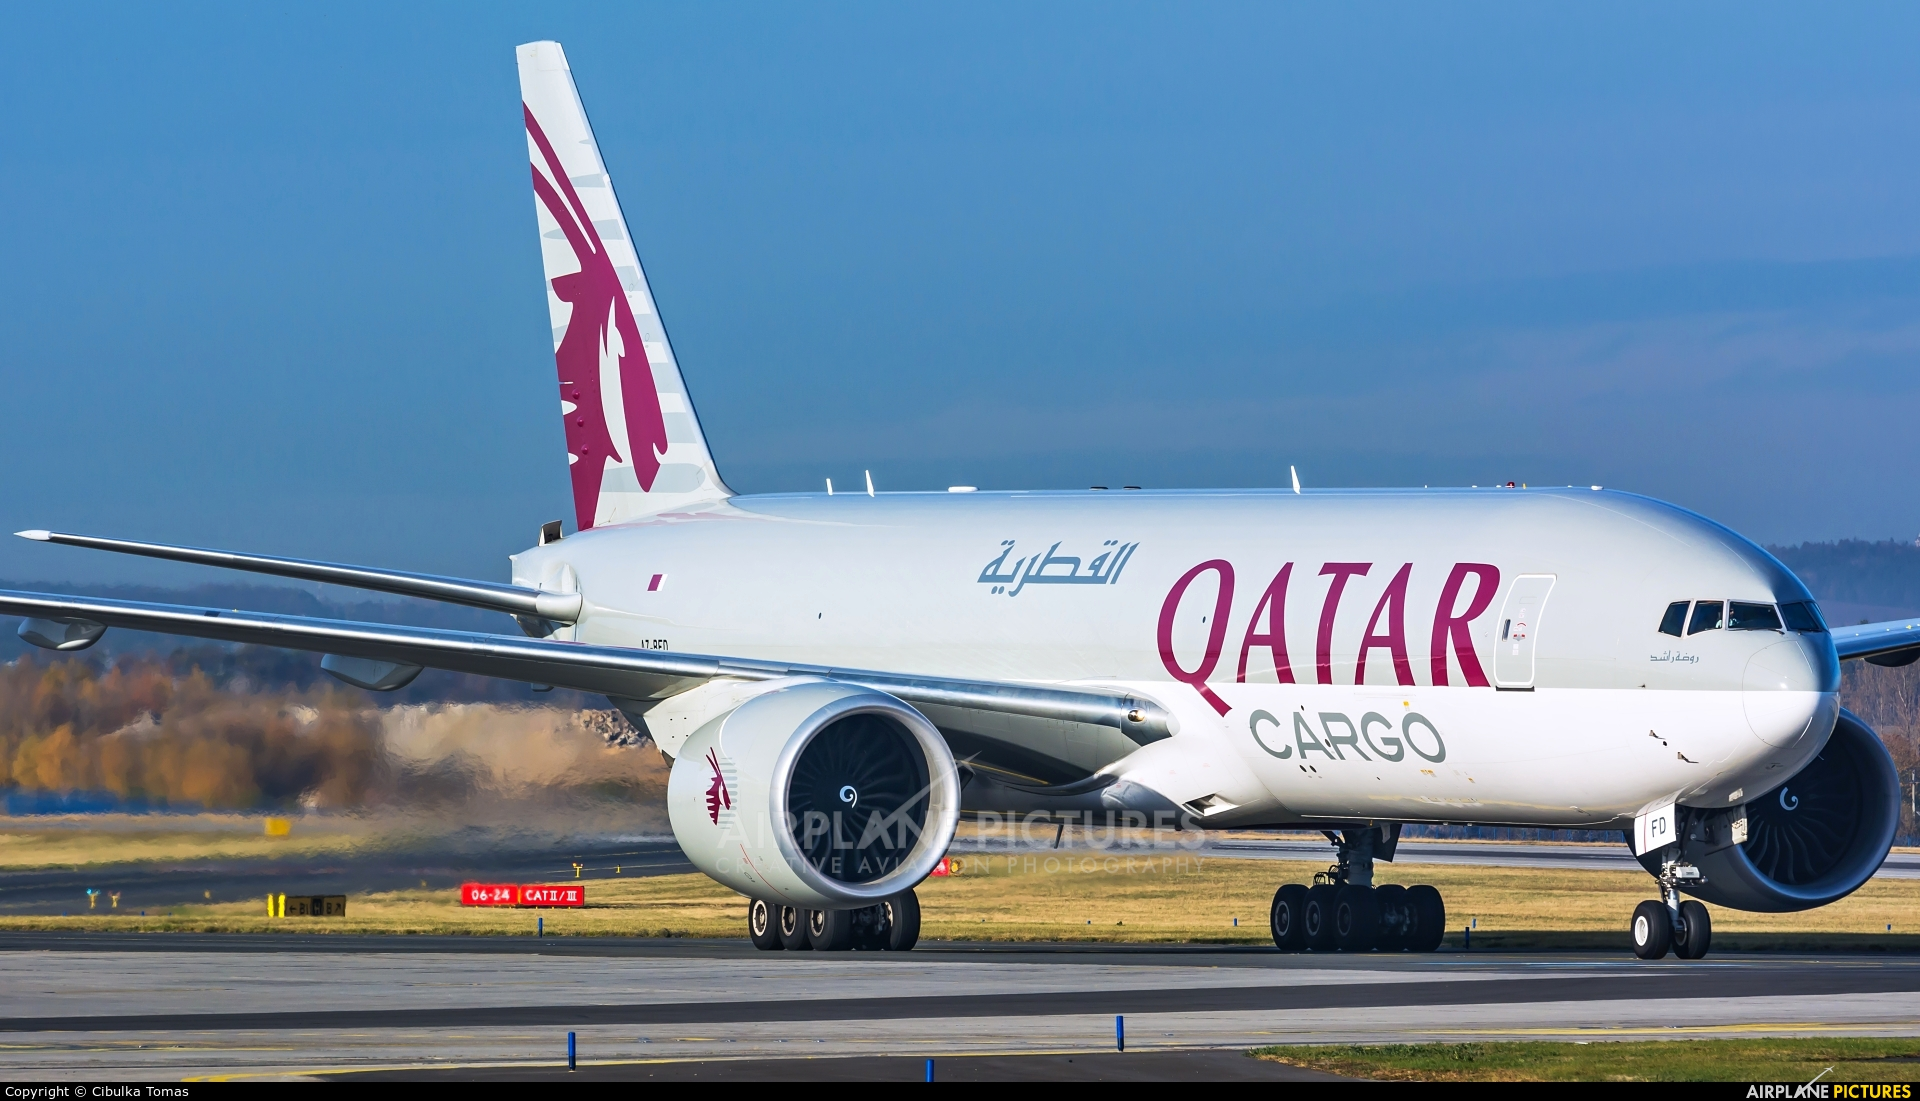 Qatar Airways Cargo A7-BFD aircraft at Prague - Václav Havel